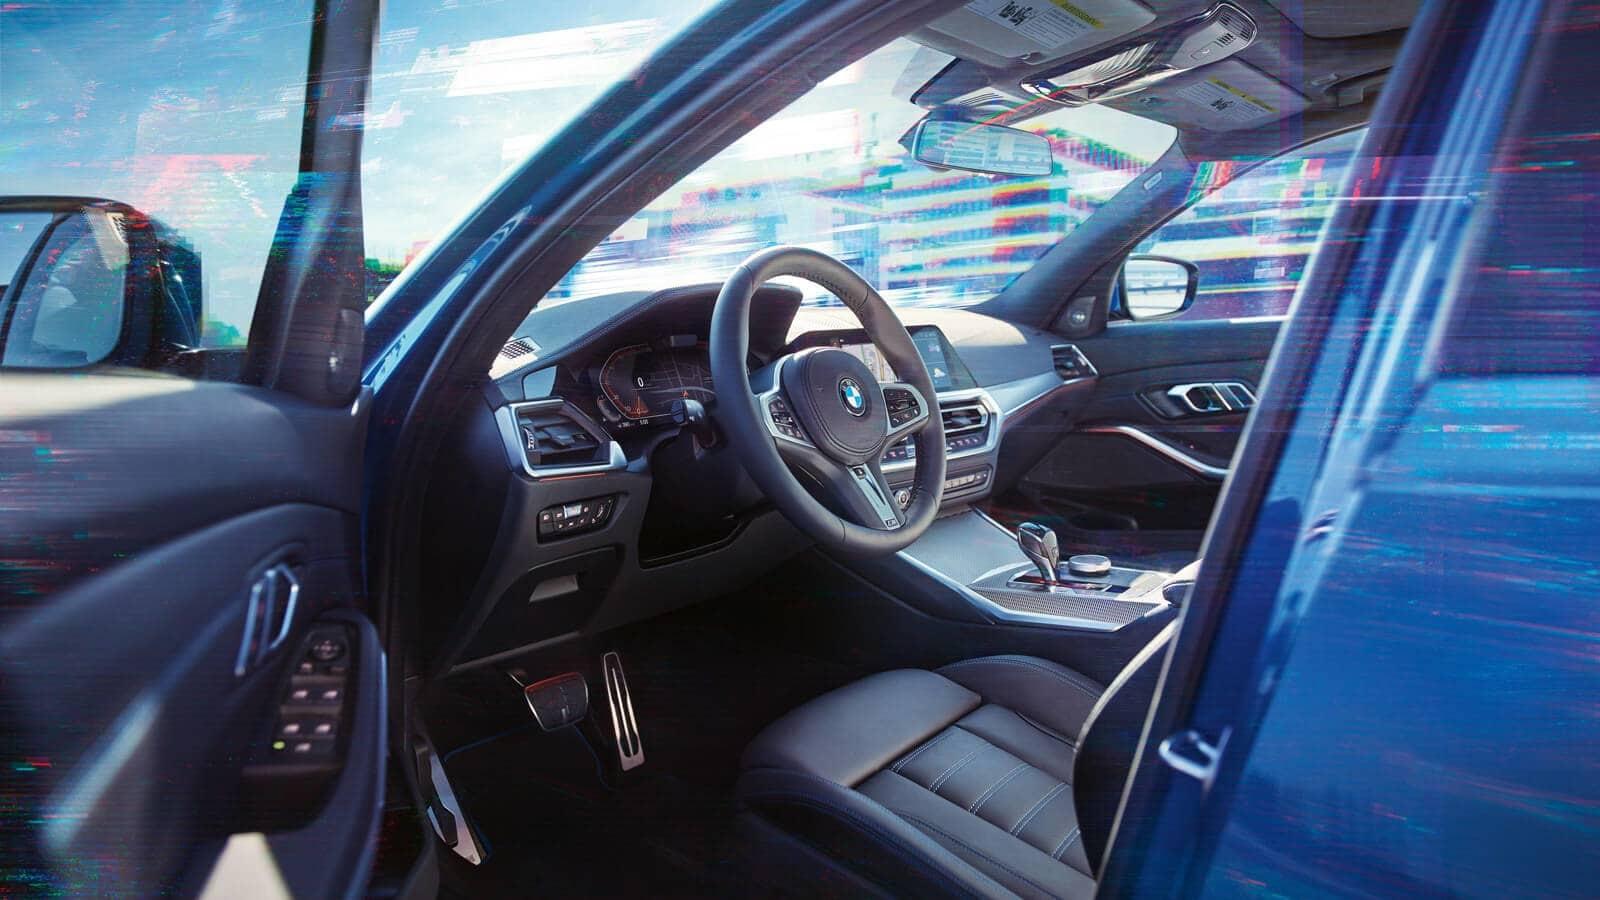 2019 3 Series Cockpit